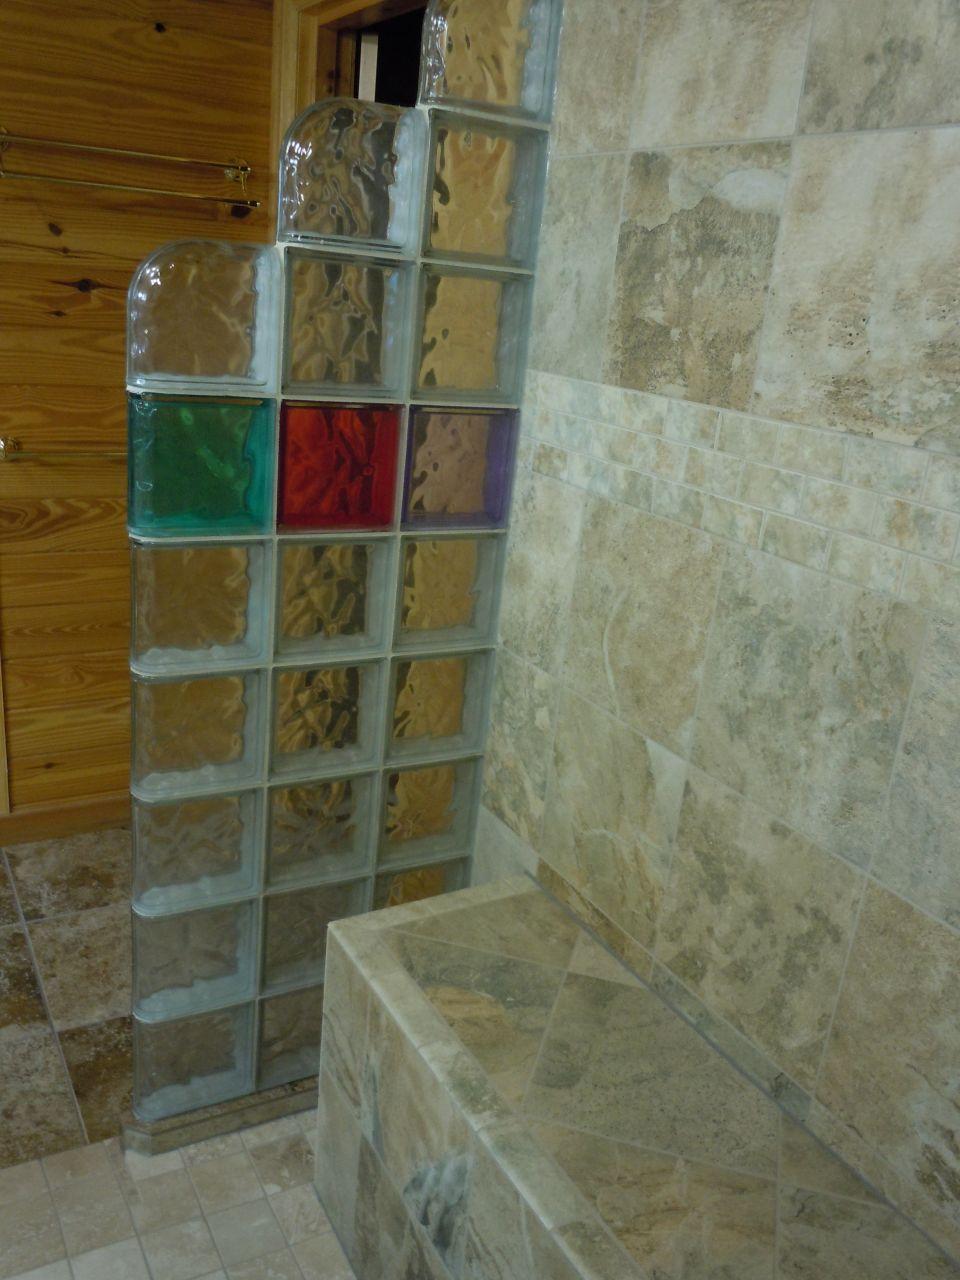 glass block shower in a rustic log home collins georgia. Black Bedroom Furniture Sets. Home Design Ideas